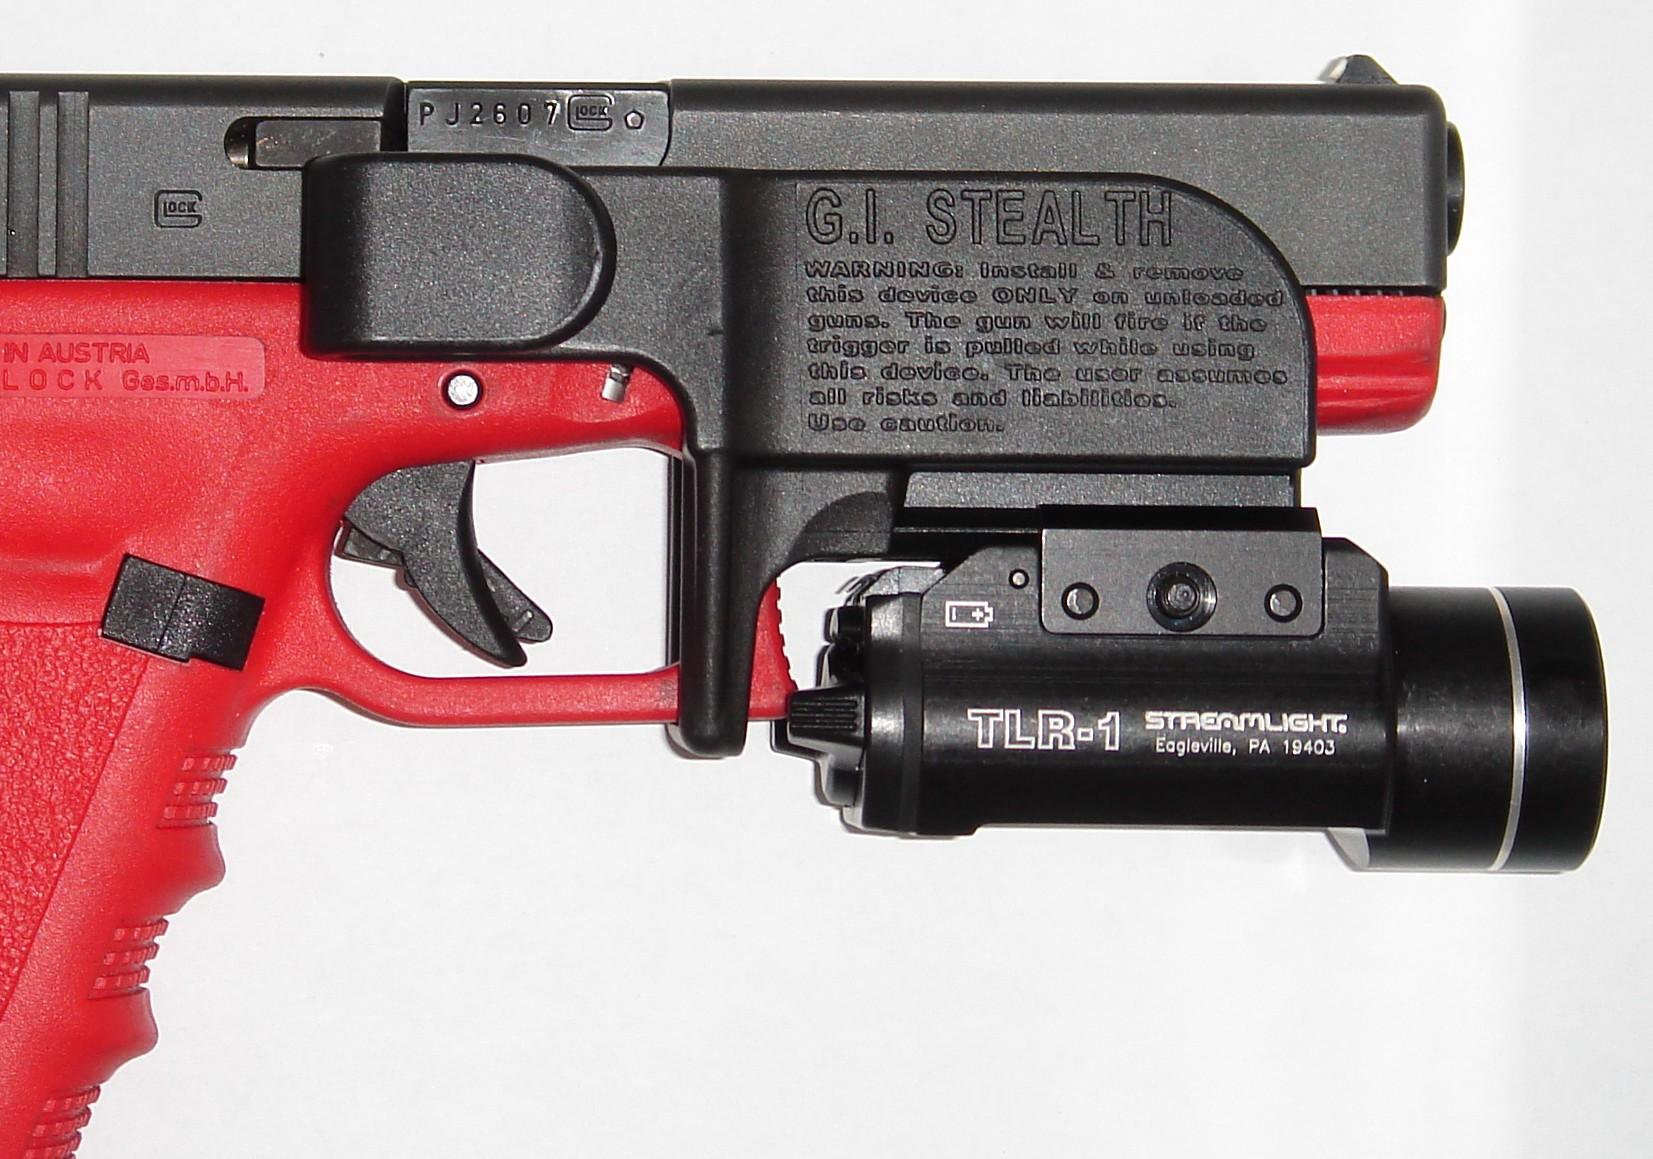 gi-stealth-redgun-5.jpg